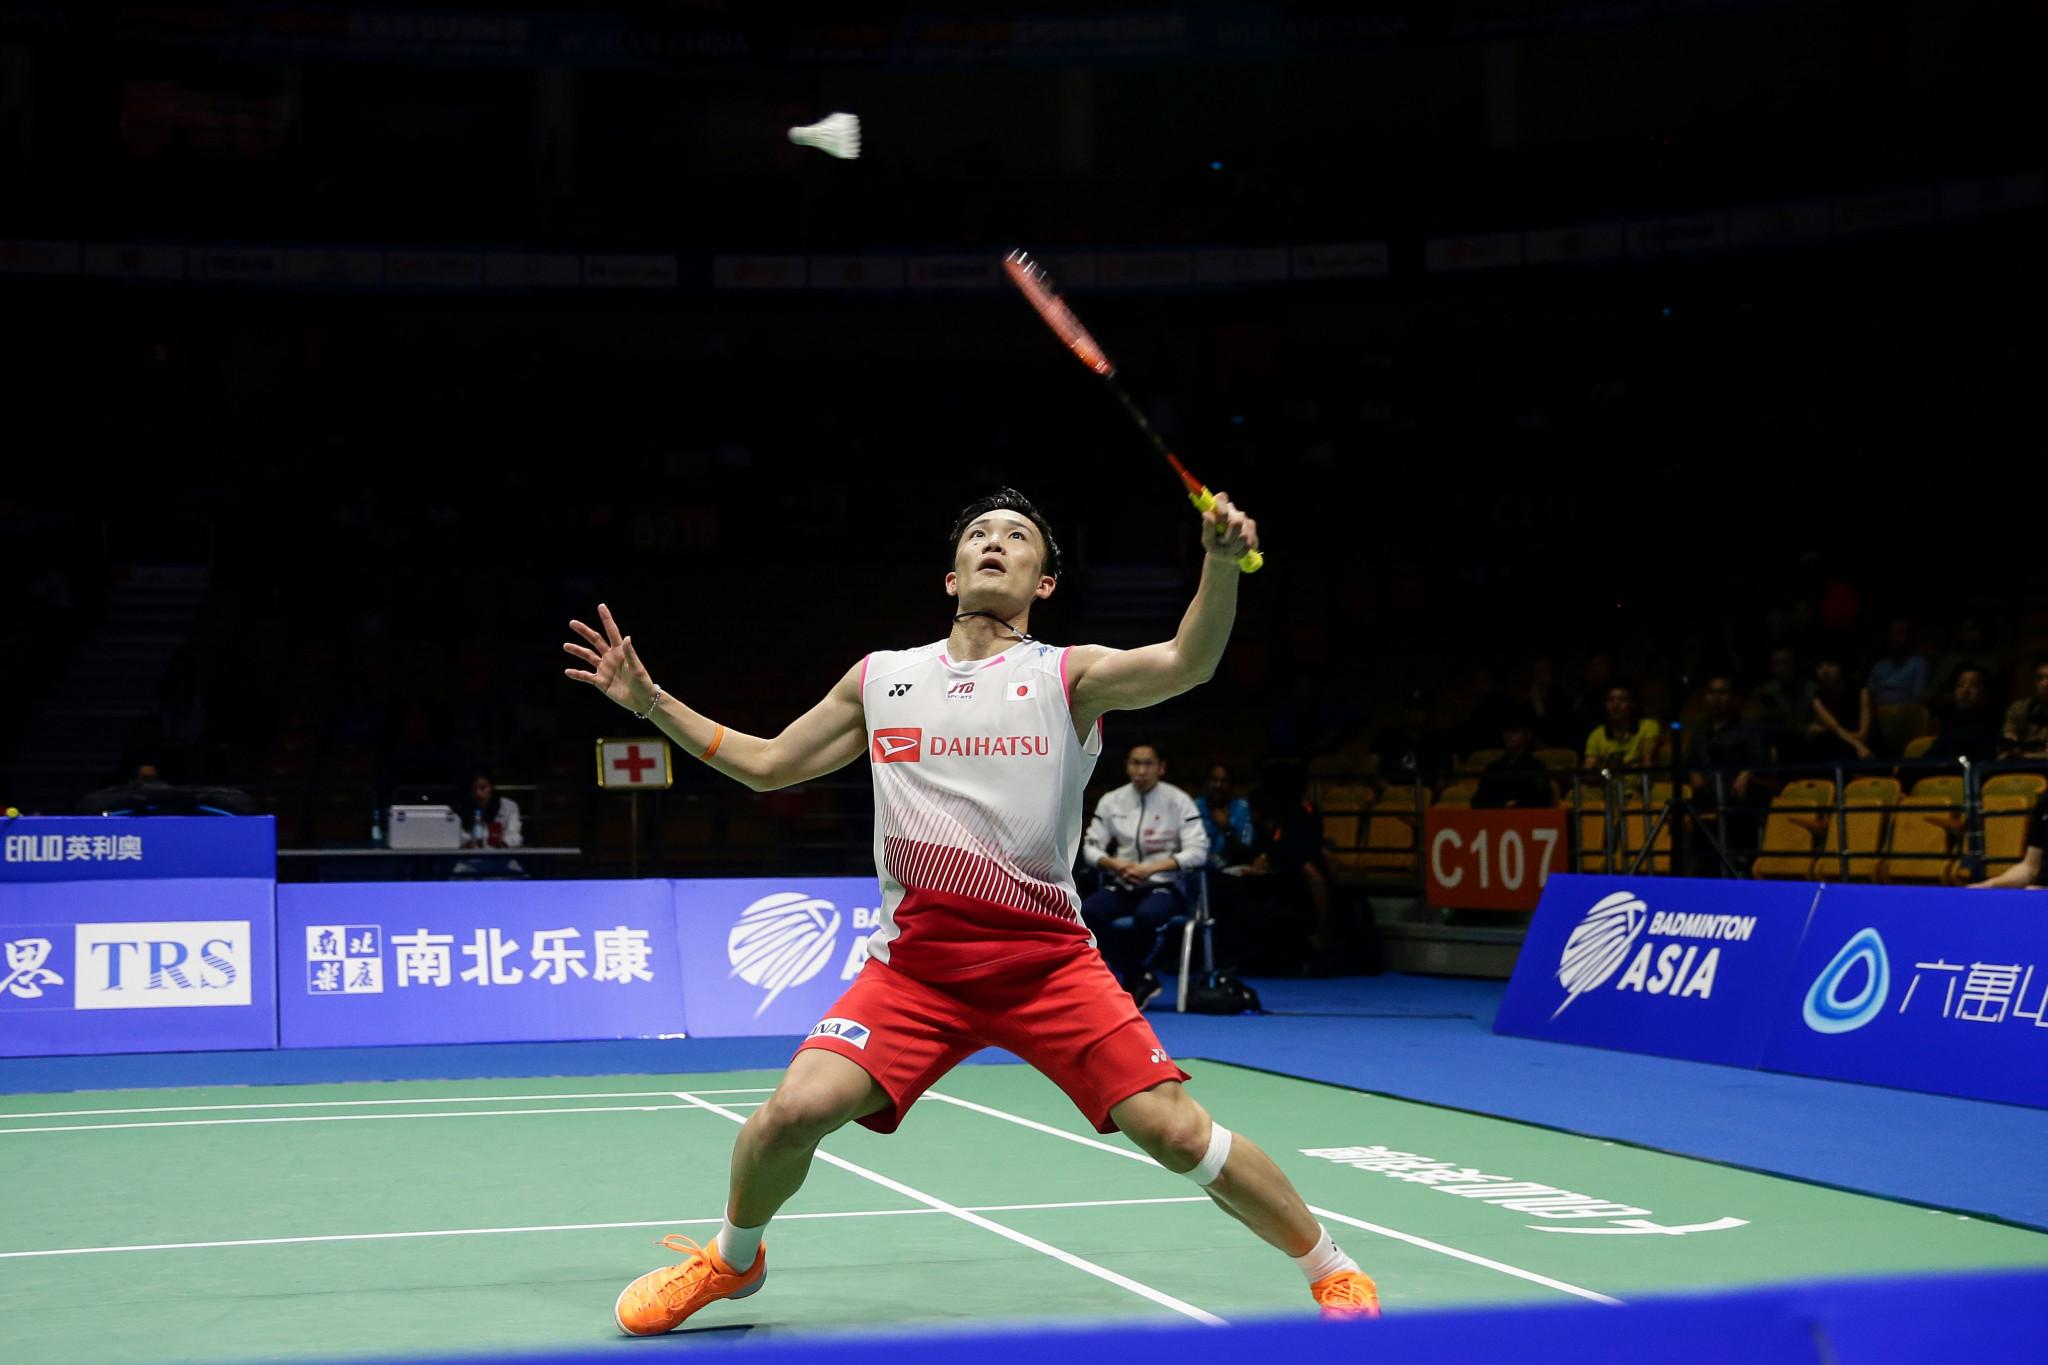 Momota retains title as Yamaguchi makes history at Badminton Asia Championships